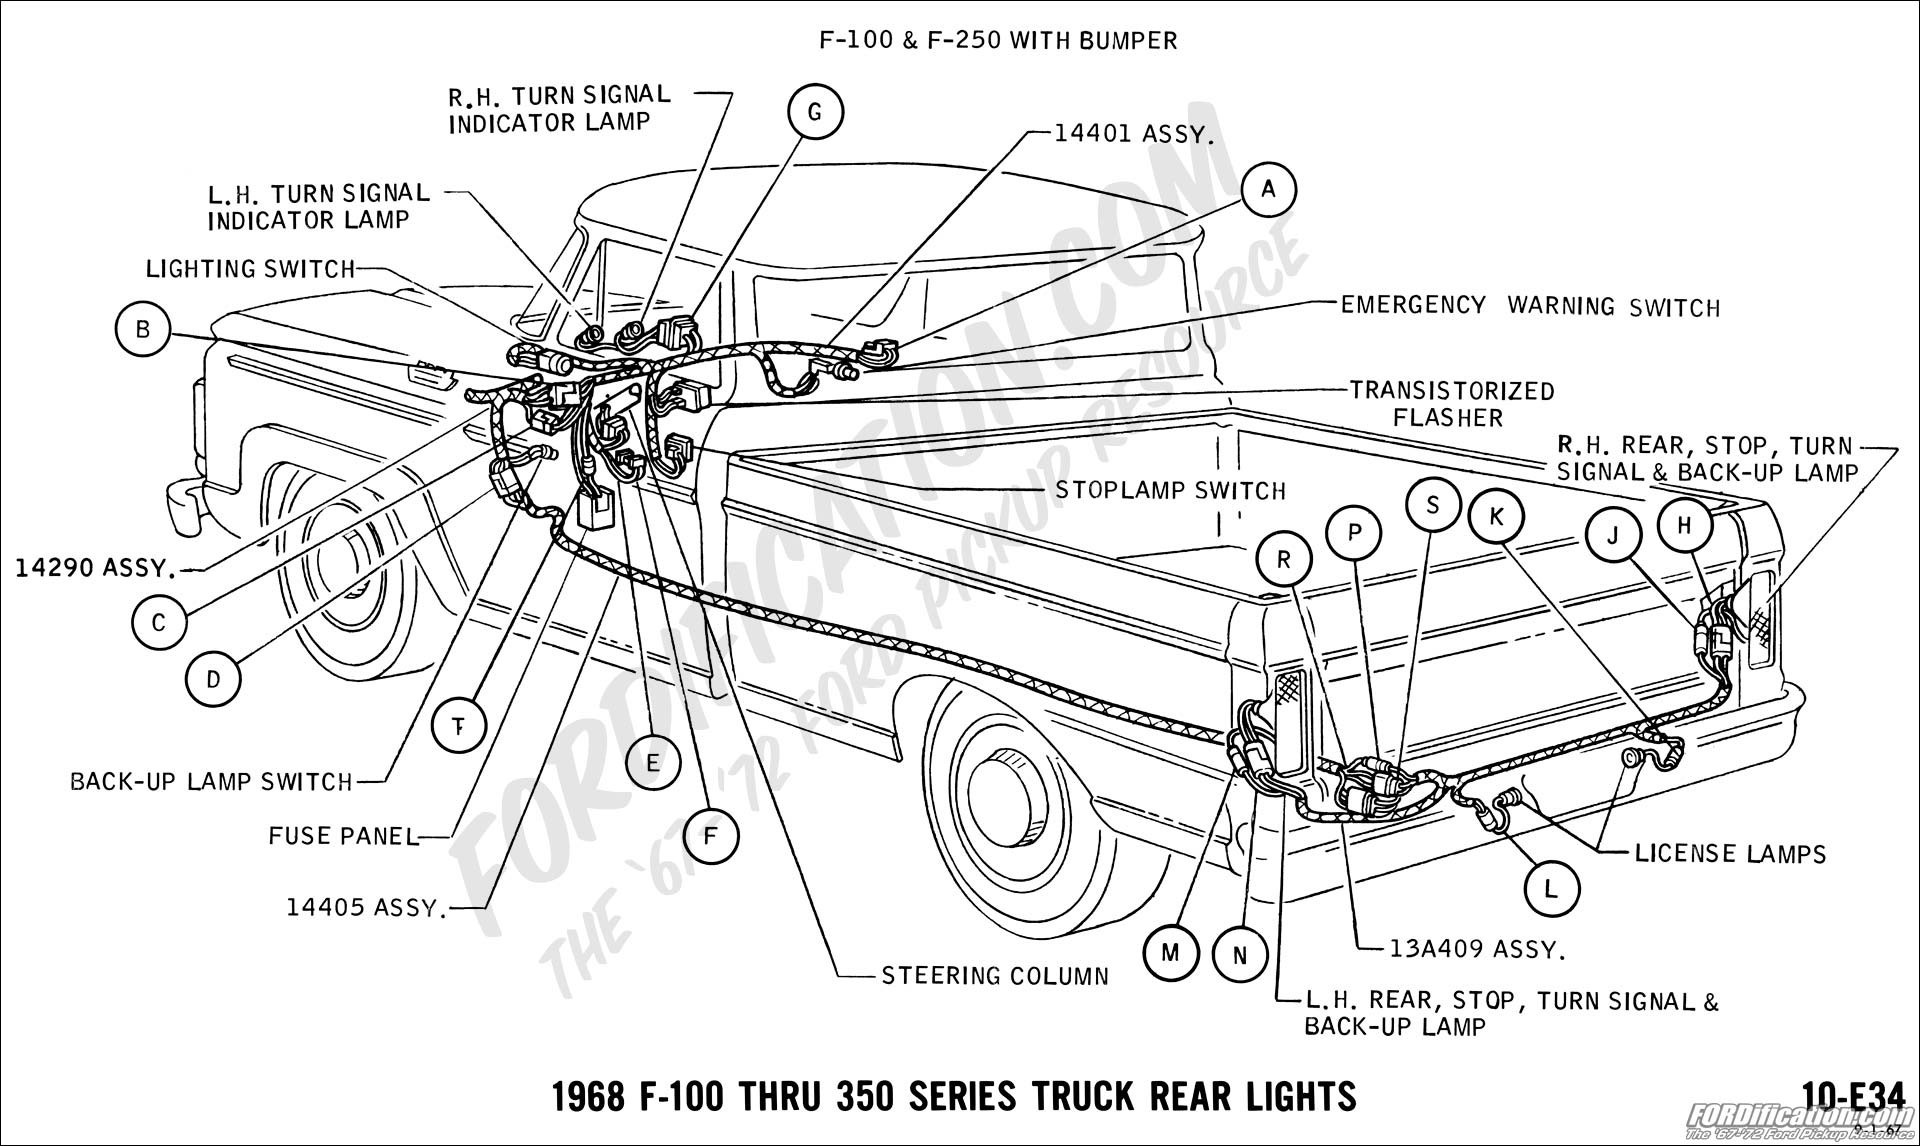 Parts Of A Pickup Truck Diagram ford Ranger Parts Diagram